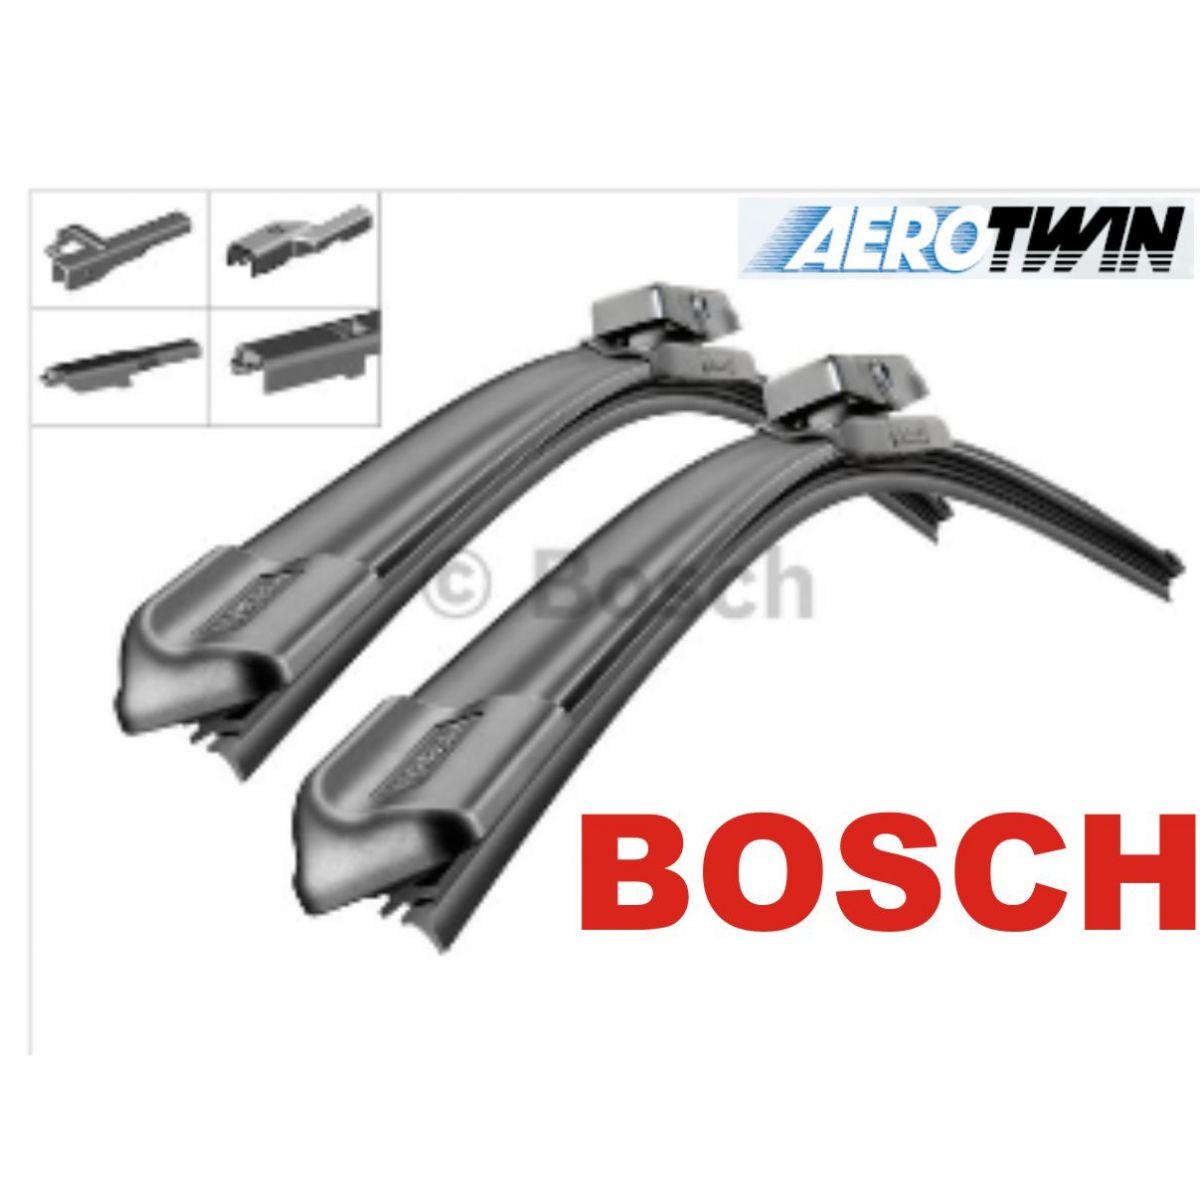 Palheta Bosch Aerotwin Plus Limpador de para brisa Bosch Fiat 500 Cabrio / 500